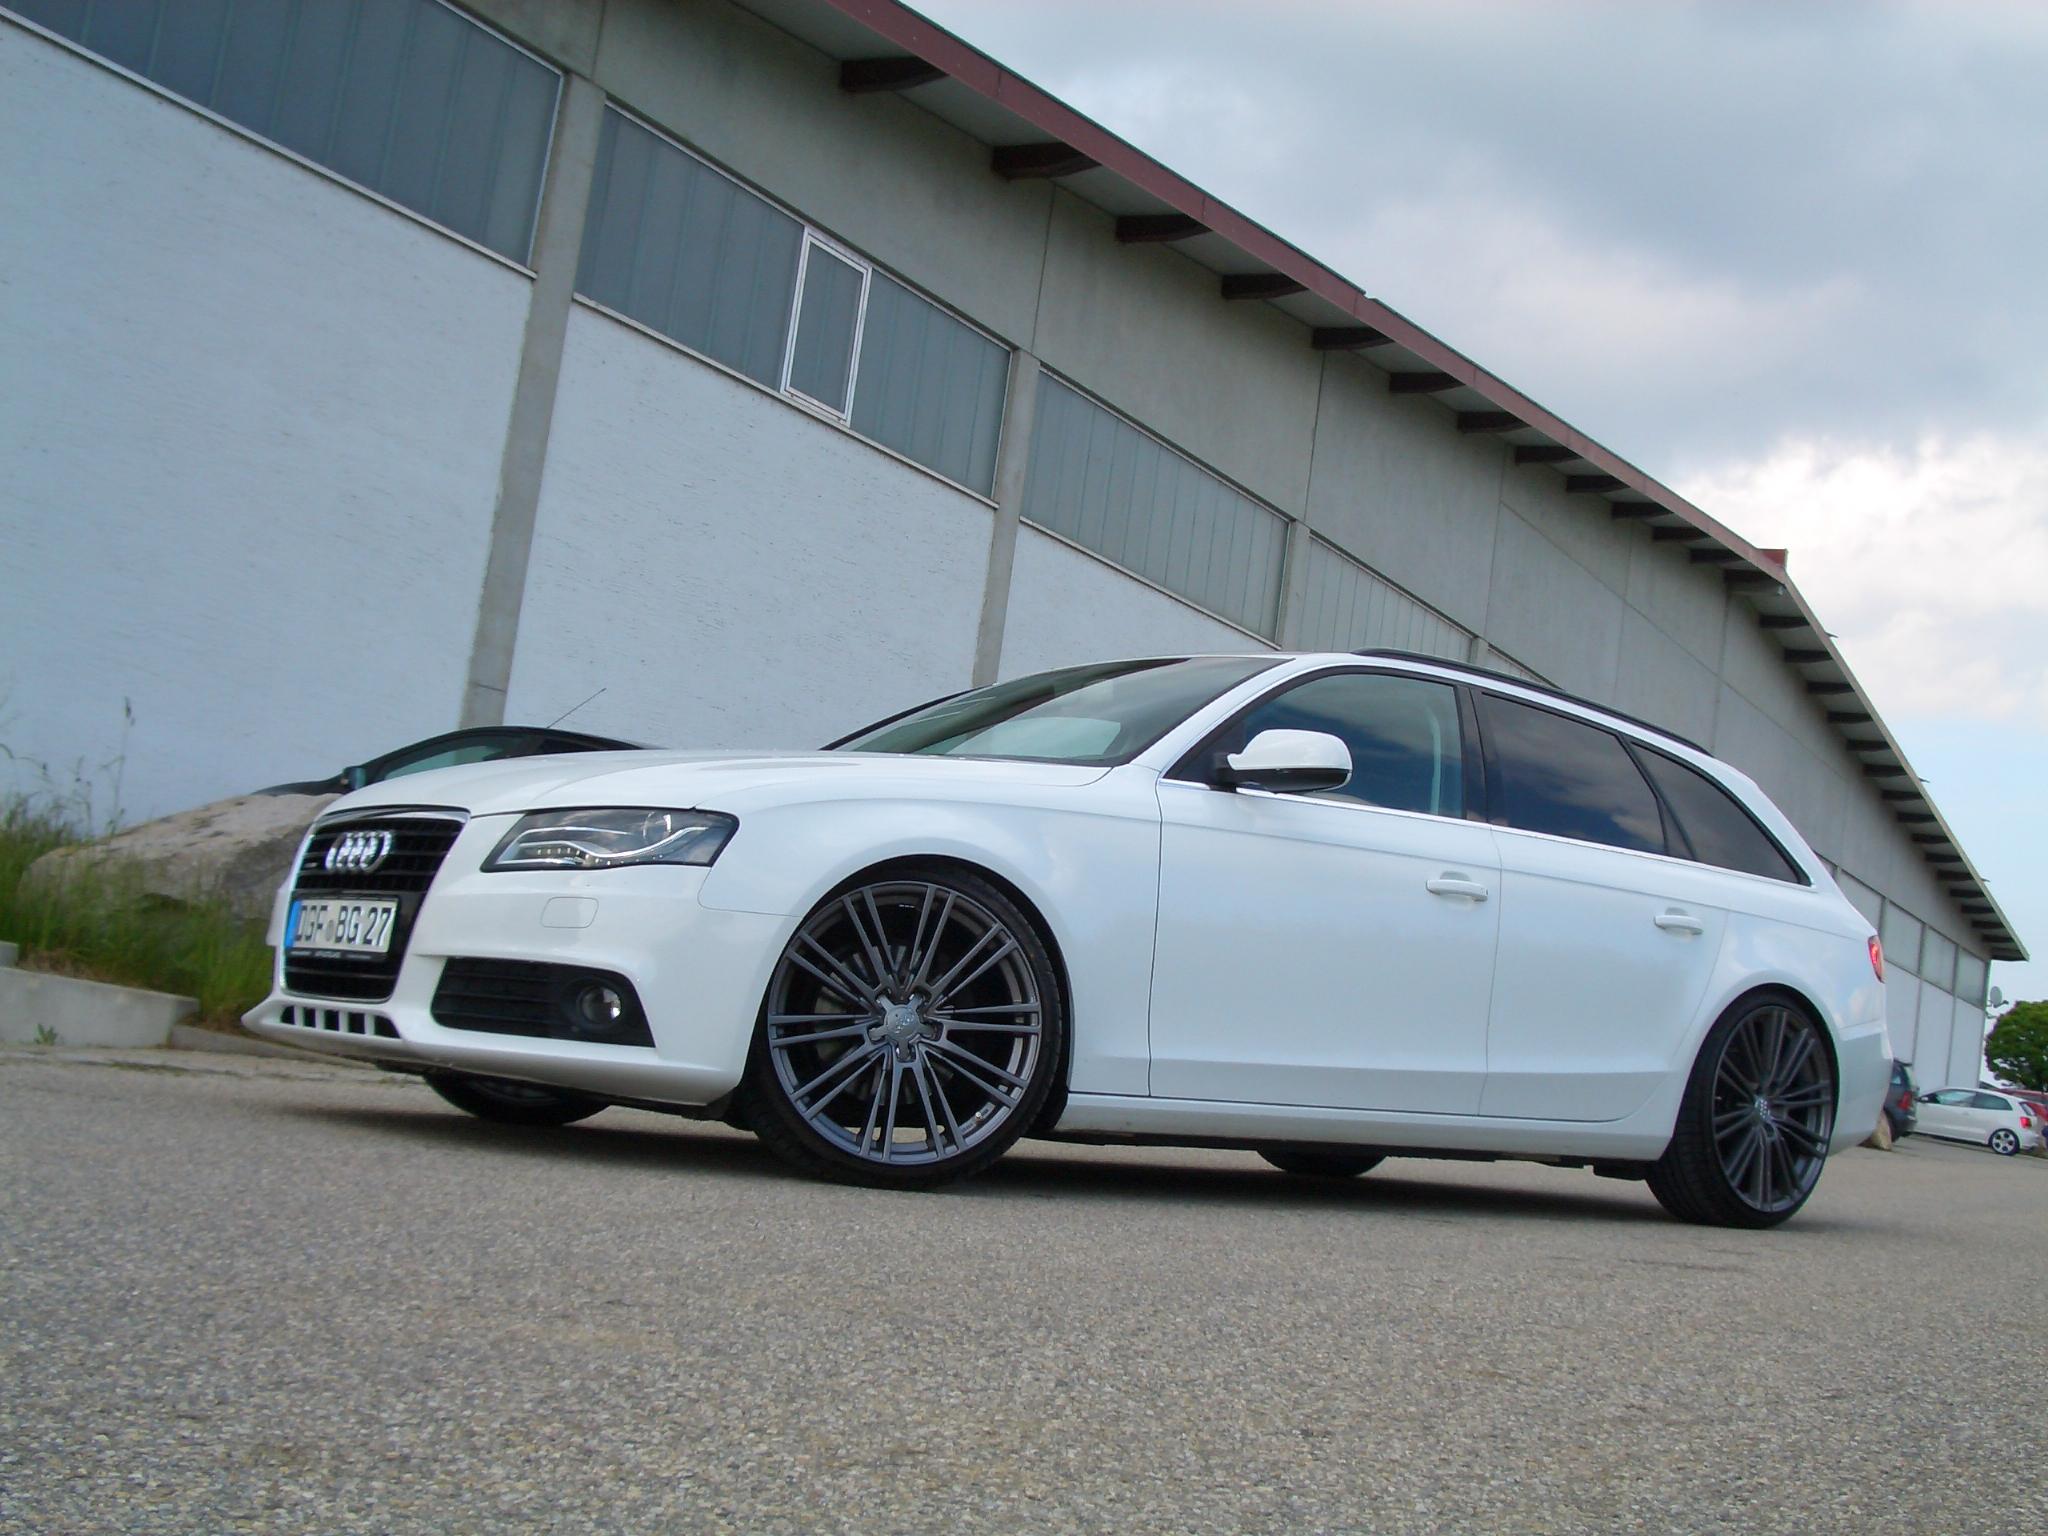 Audi A4 B8 Atg Auto Tuning Geiger